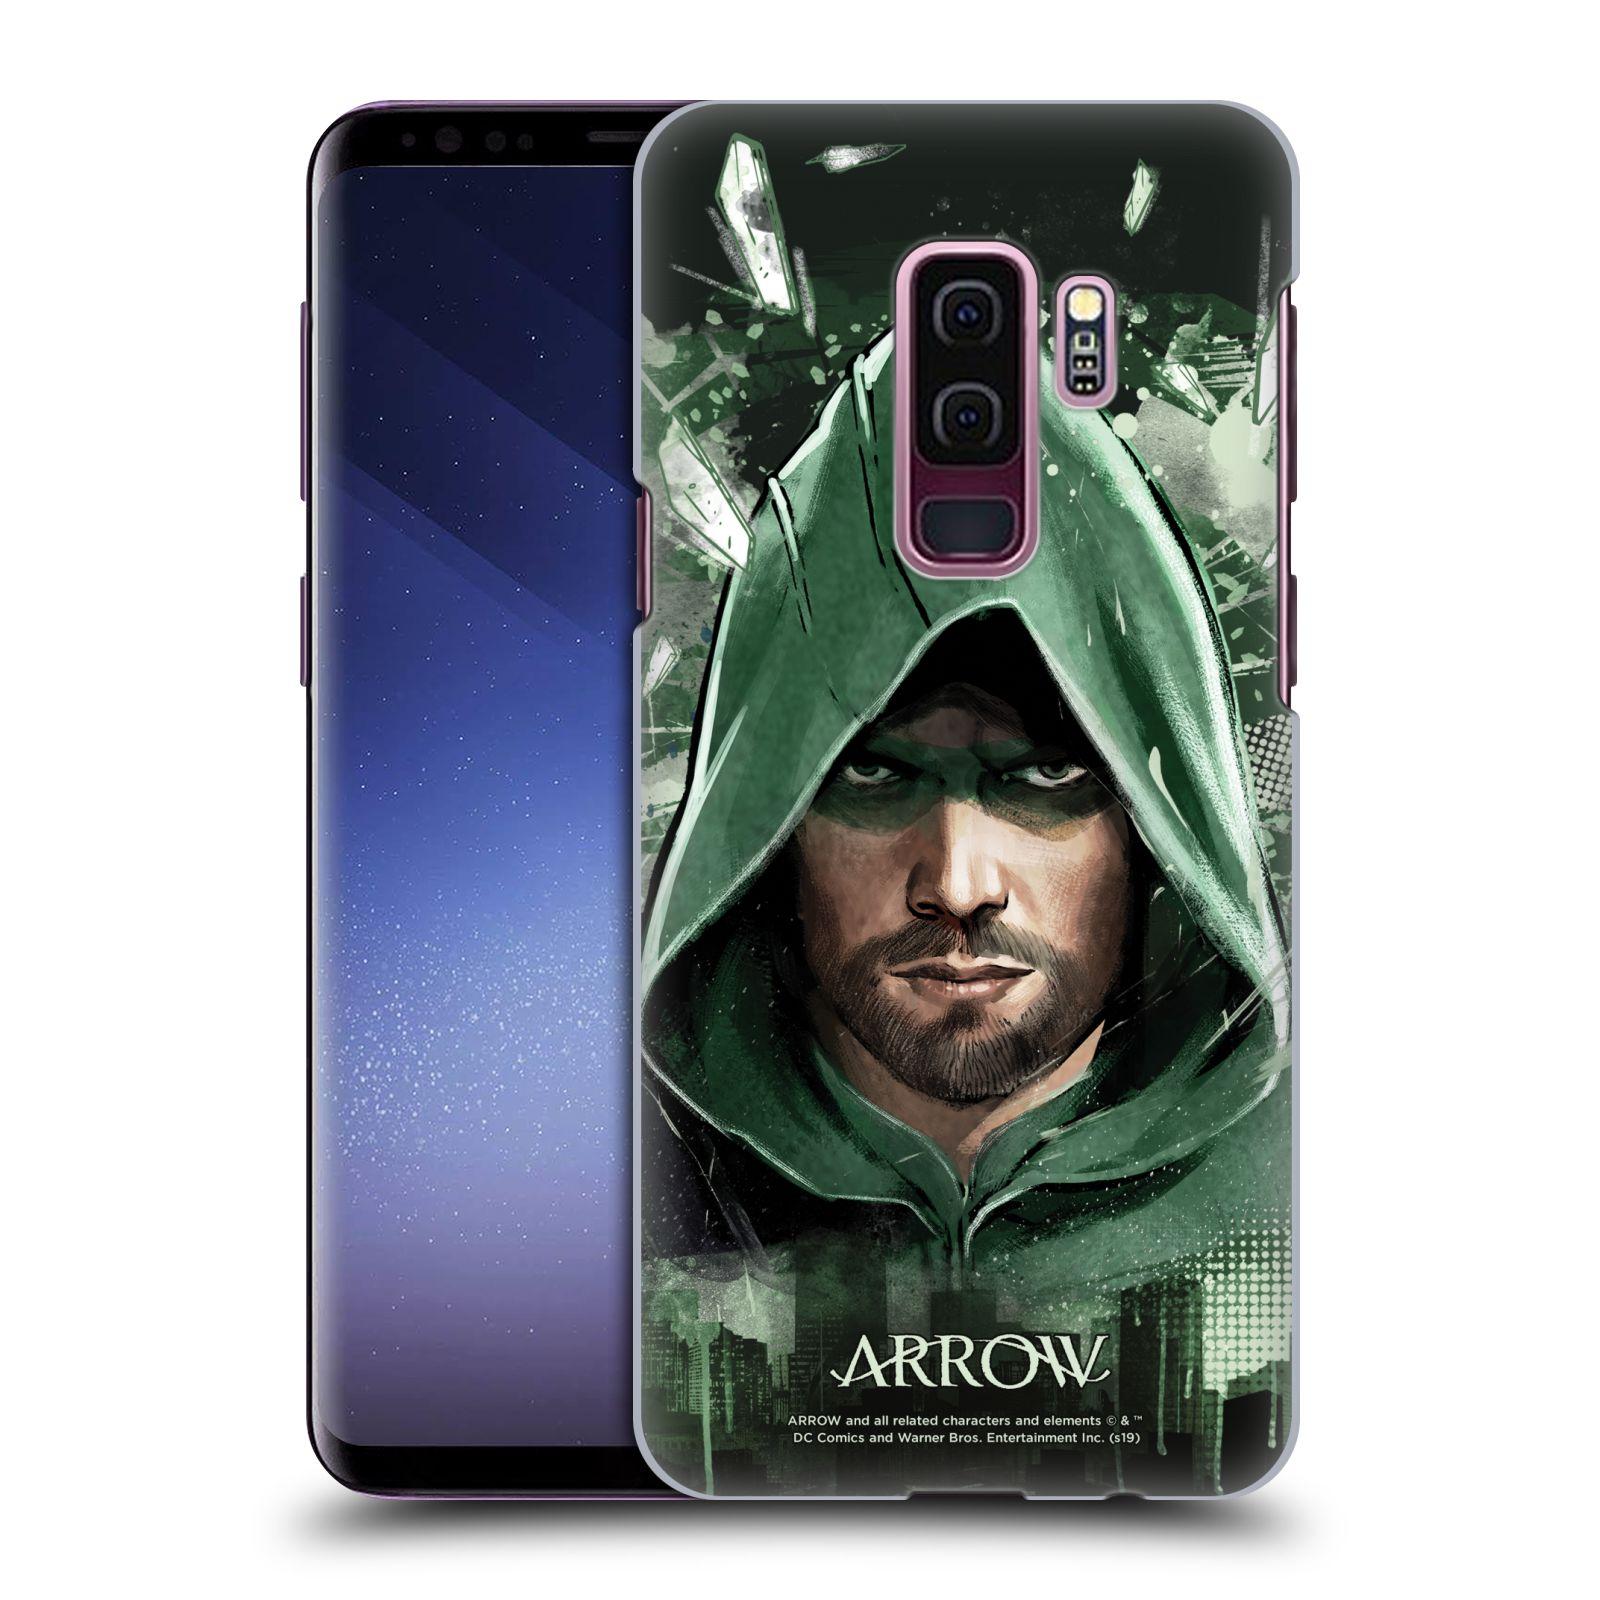 Pouzdro na mobil Samsung Galaxy S9+ / S9 PLUS - HEAD CASE - Seriál Arrow - kreslený motiv